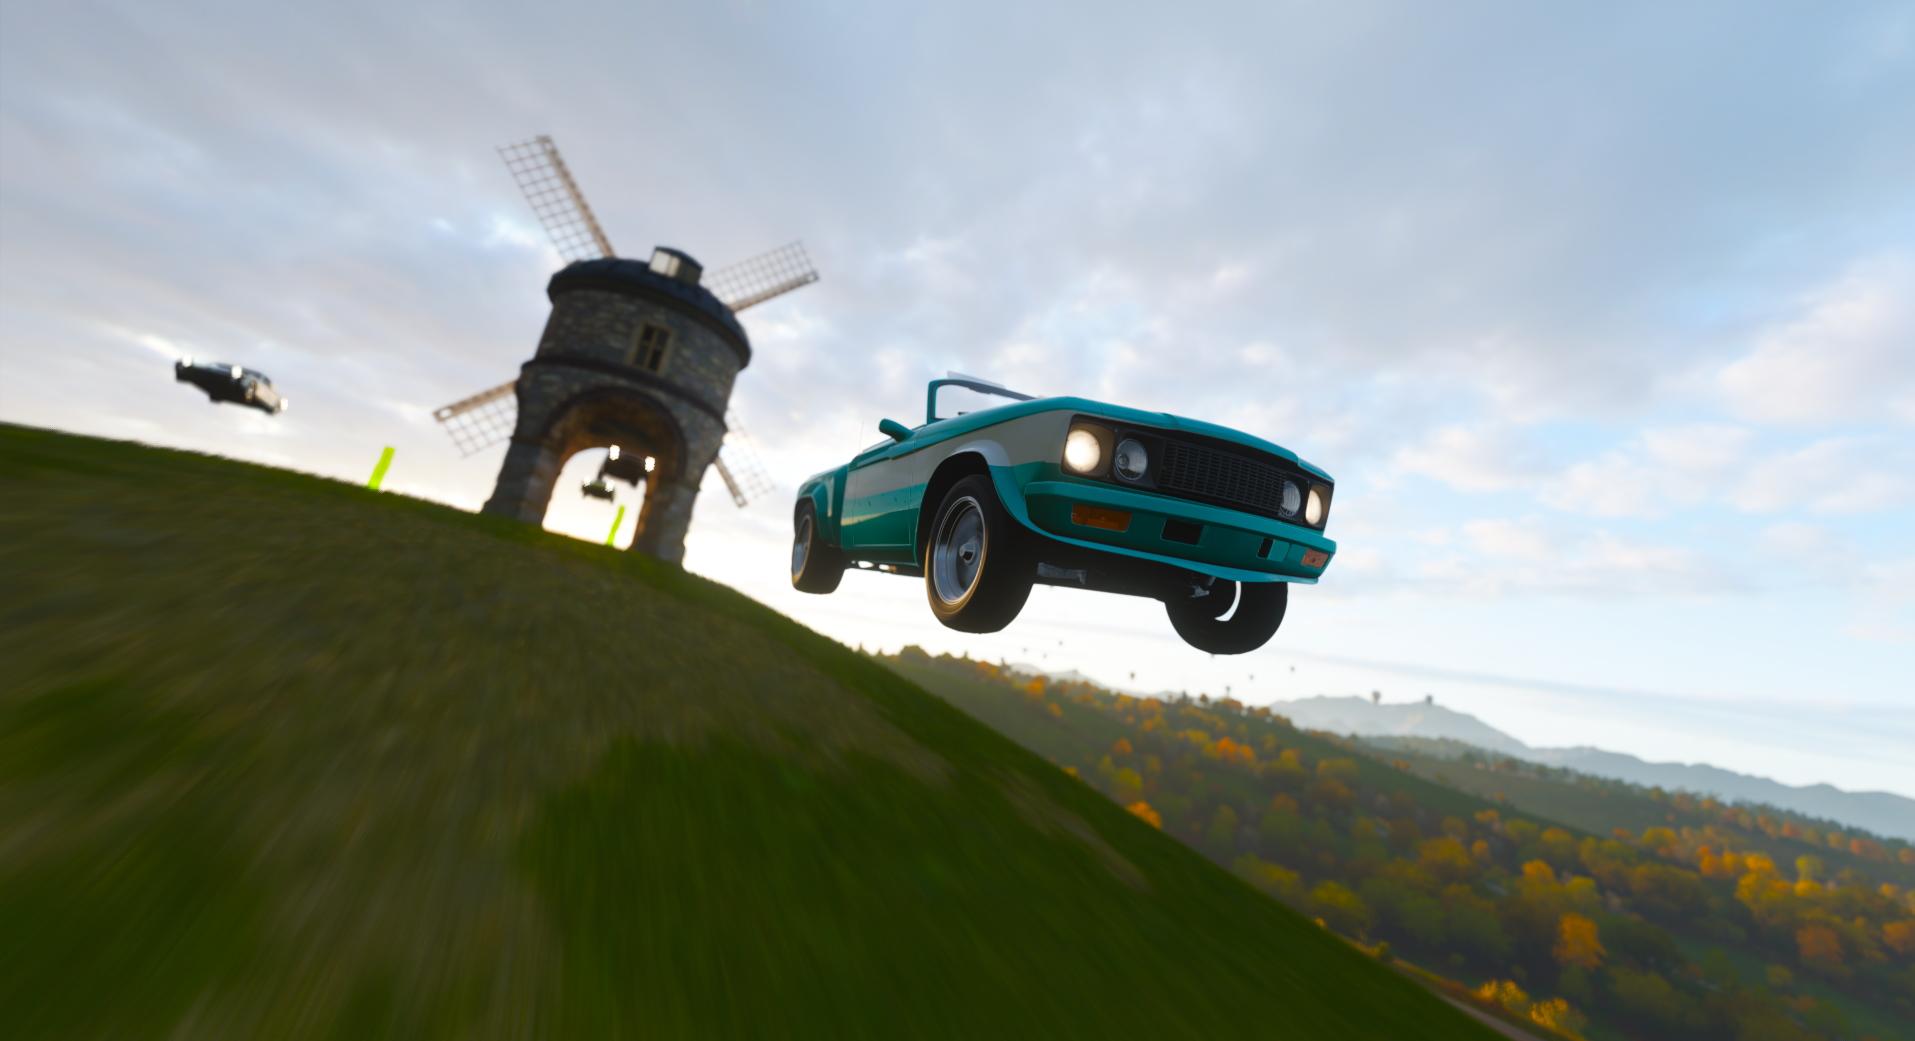 Forza Horizon 4: Hot Wheels Legends car pack - Is it worth it?